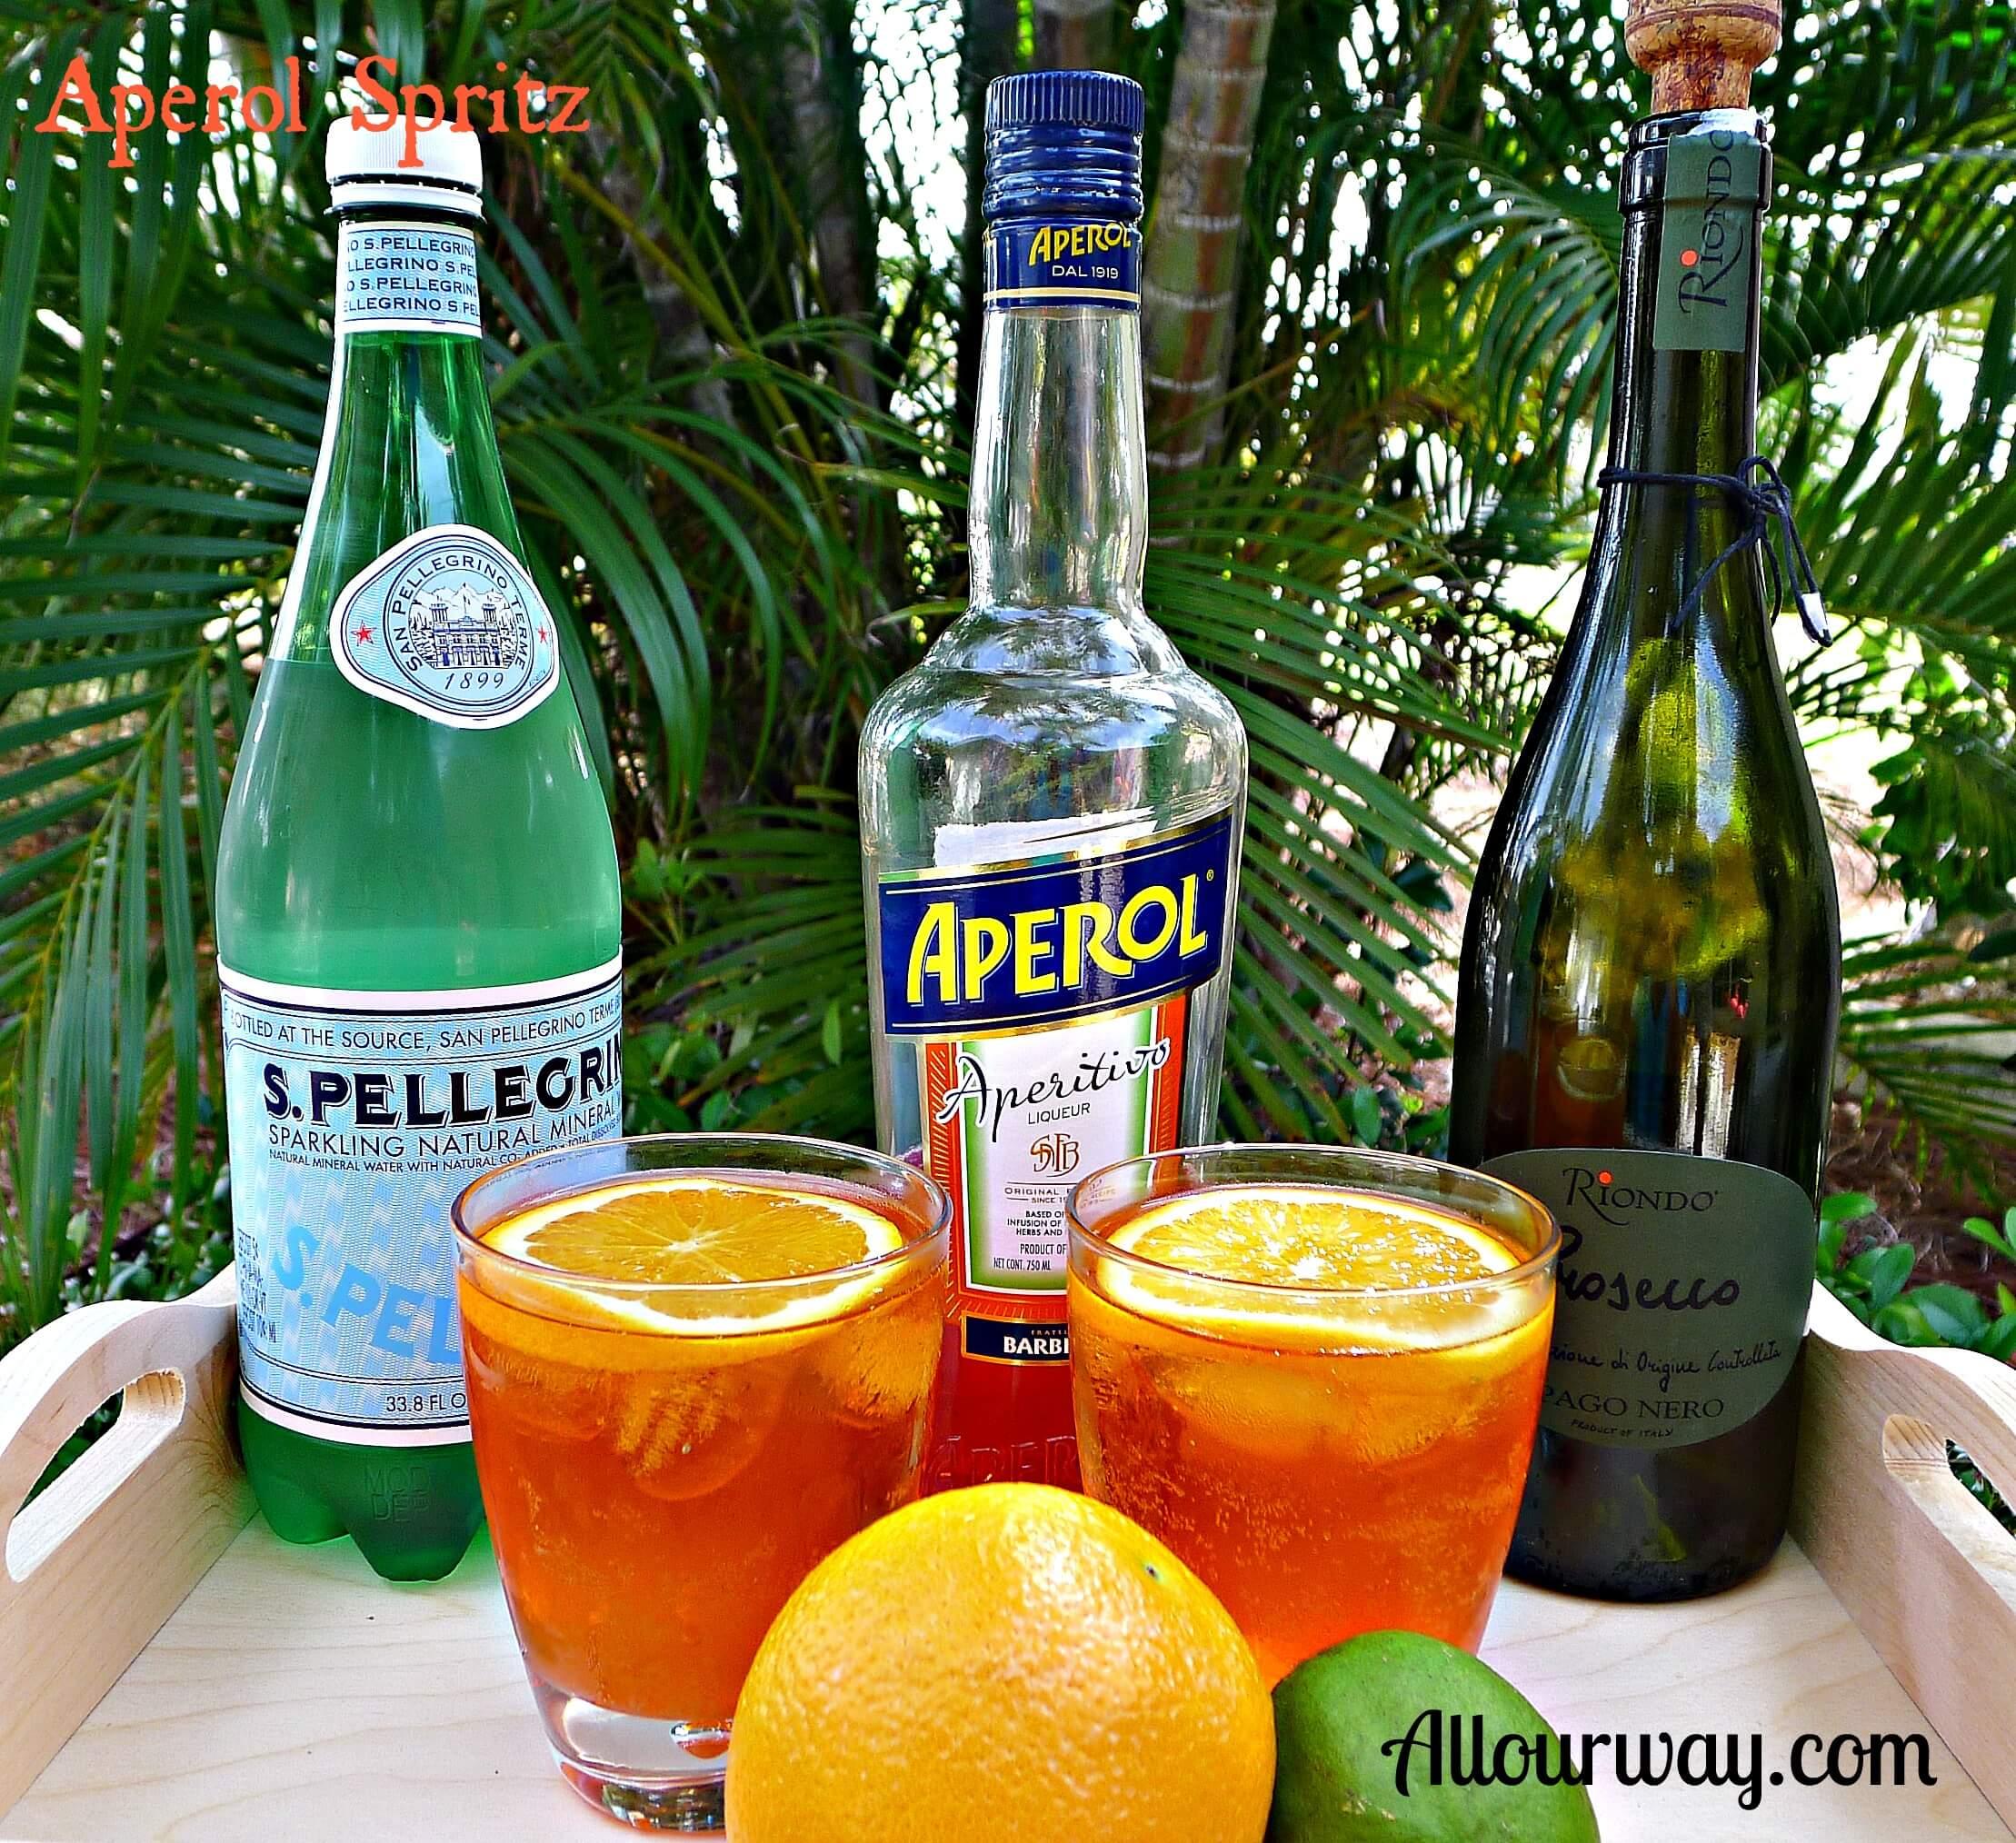 Aperol Spritz made with Aperol Liqueur, Prosecco, San Pellegrino ...